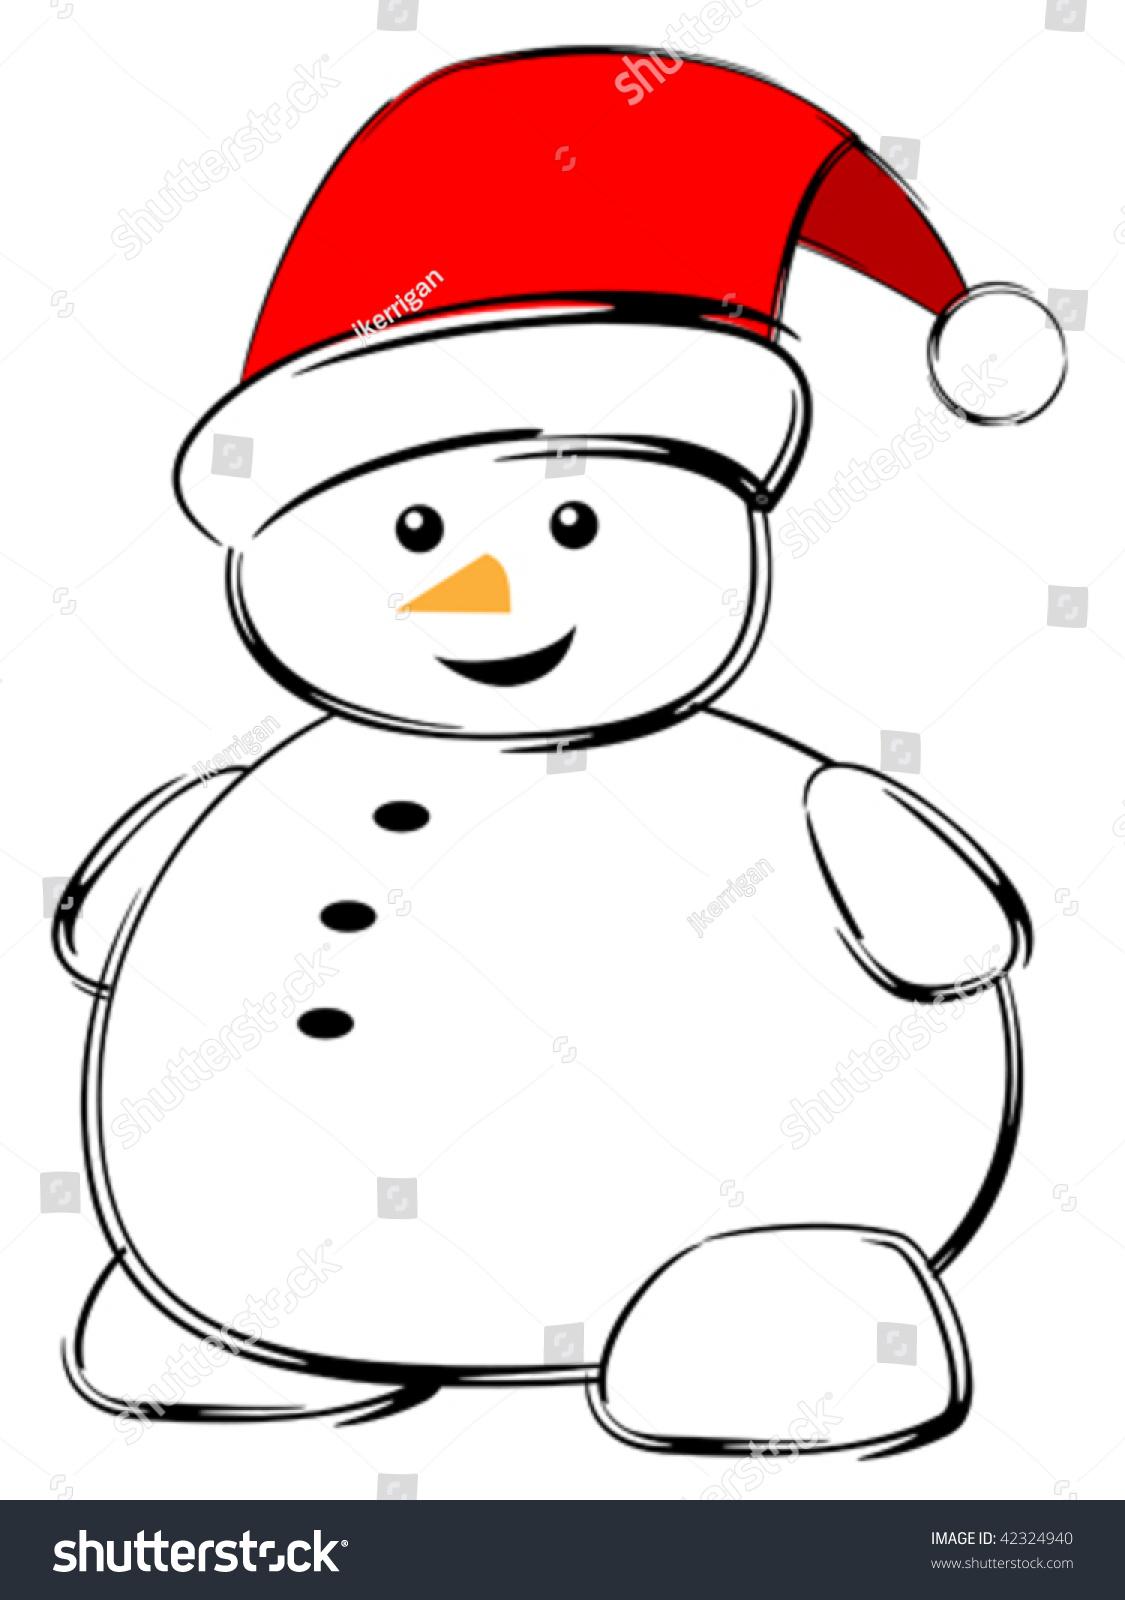 Vector illustration small cute snowman cartoon stock for Small snowman